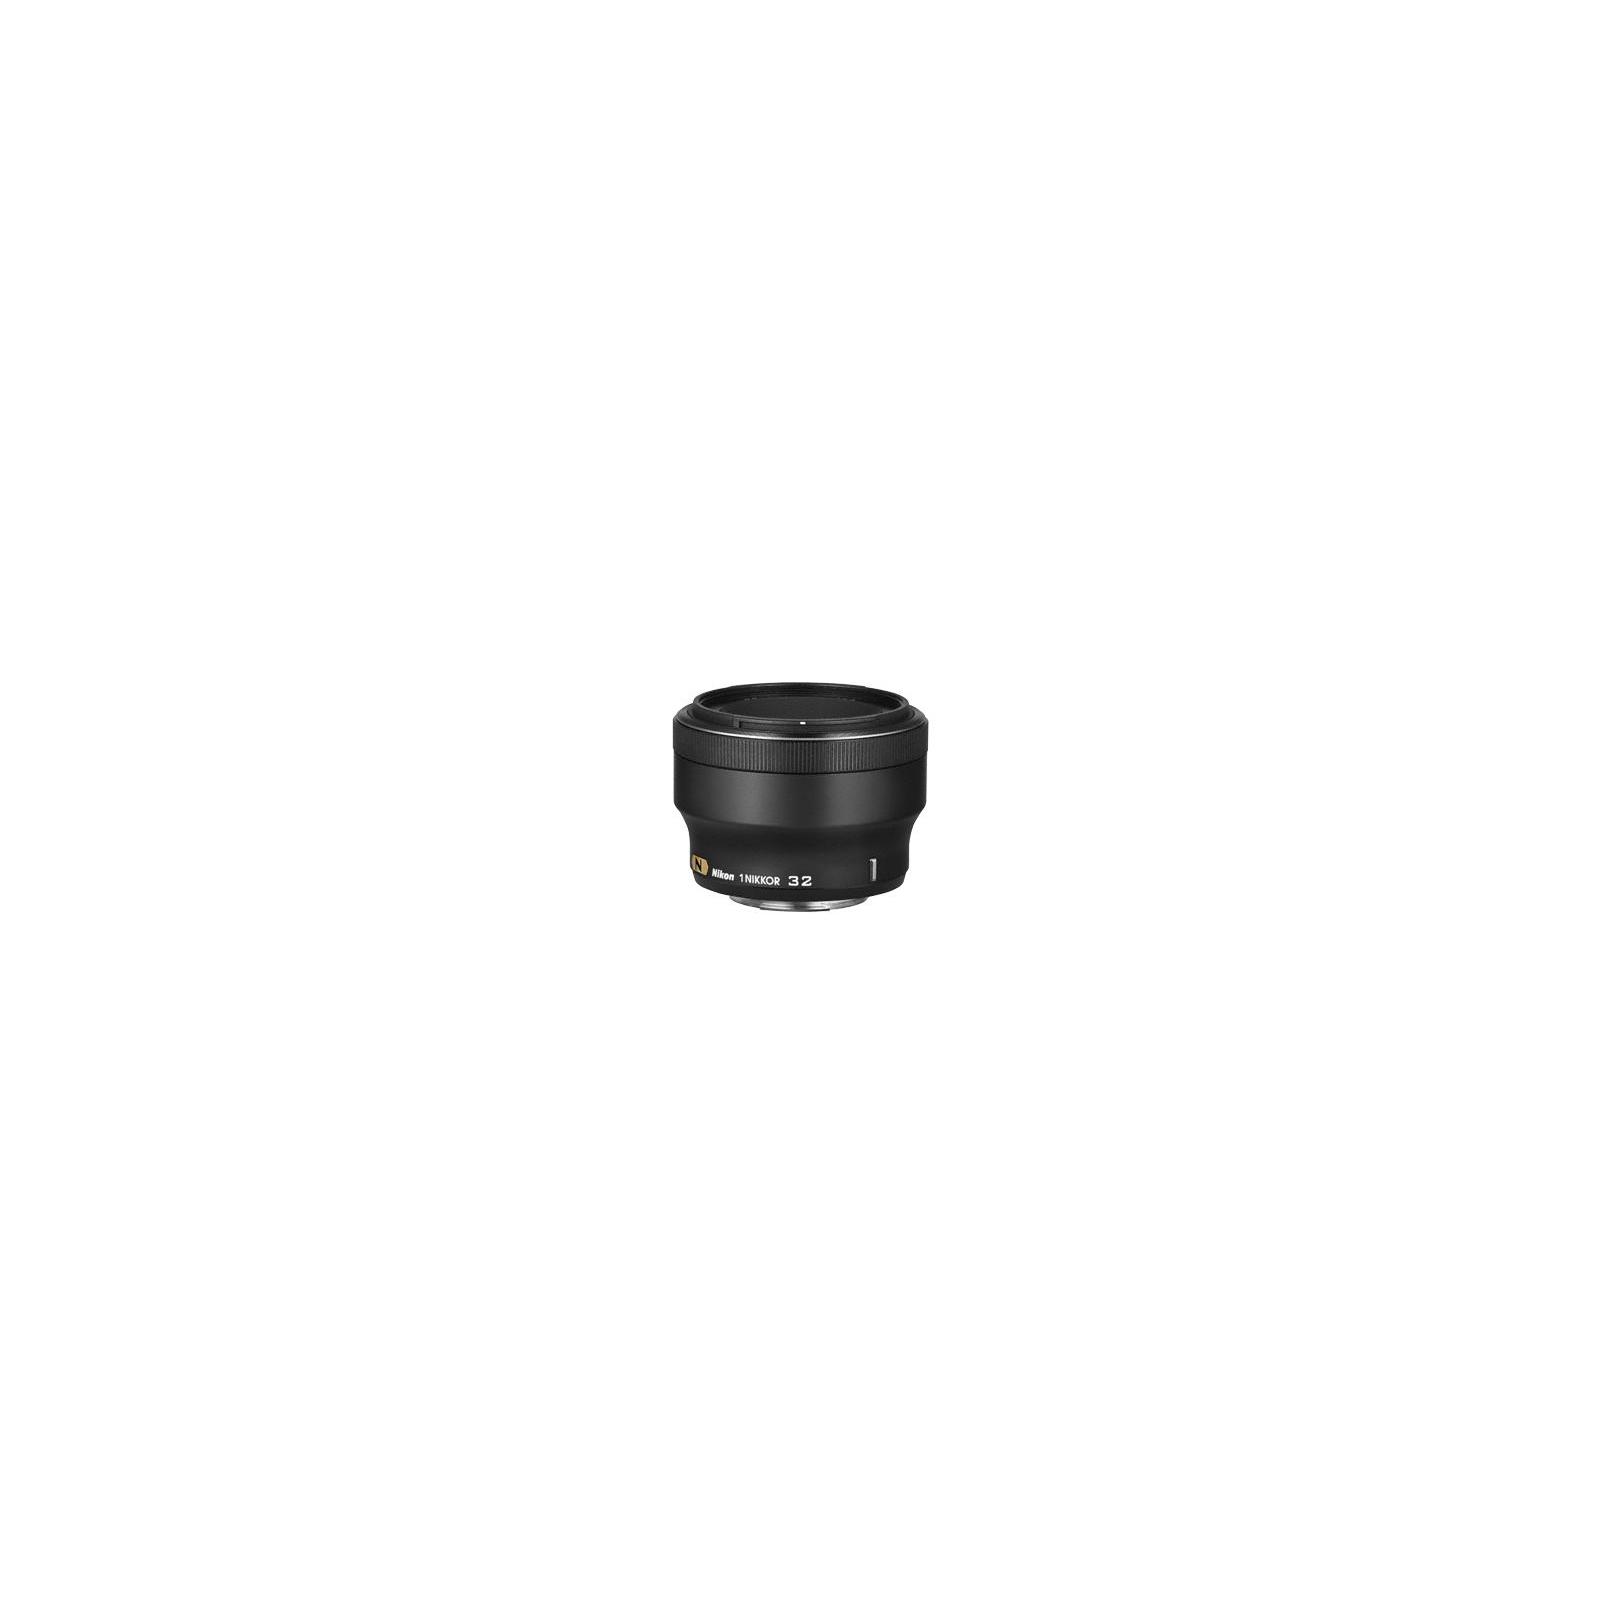 Объектив Nikon 1 Nikkor 32mm f/1.2 black (JVA301DA) изображение 2